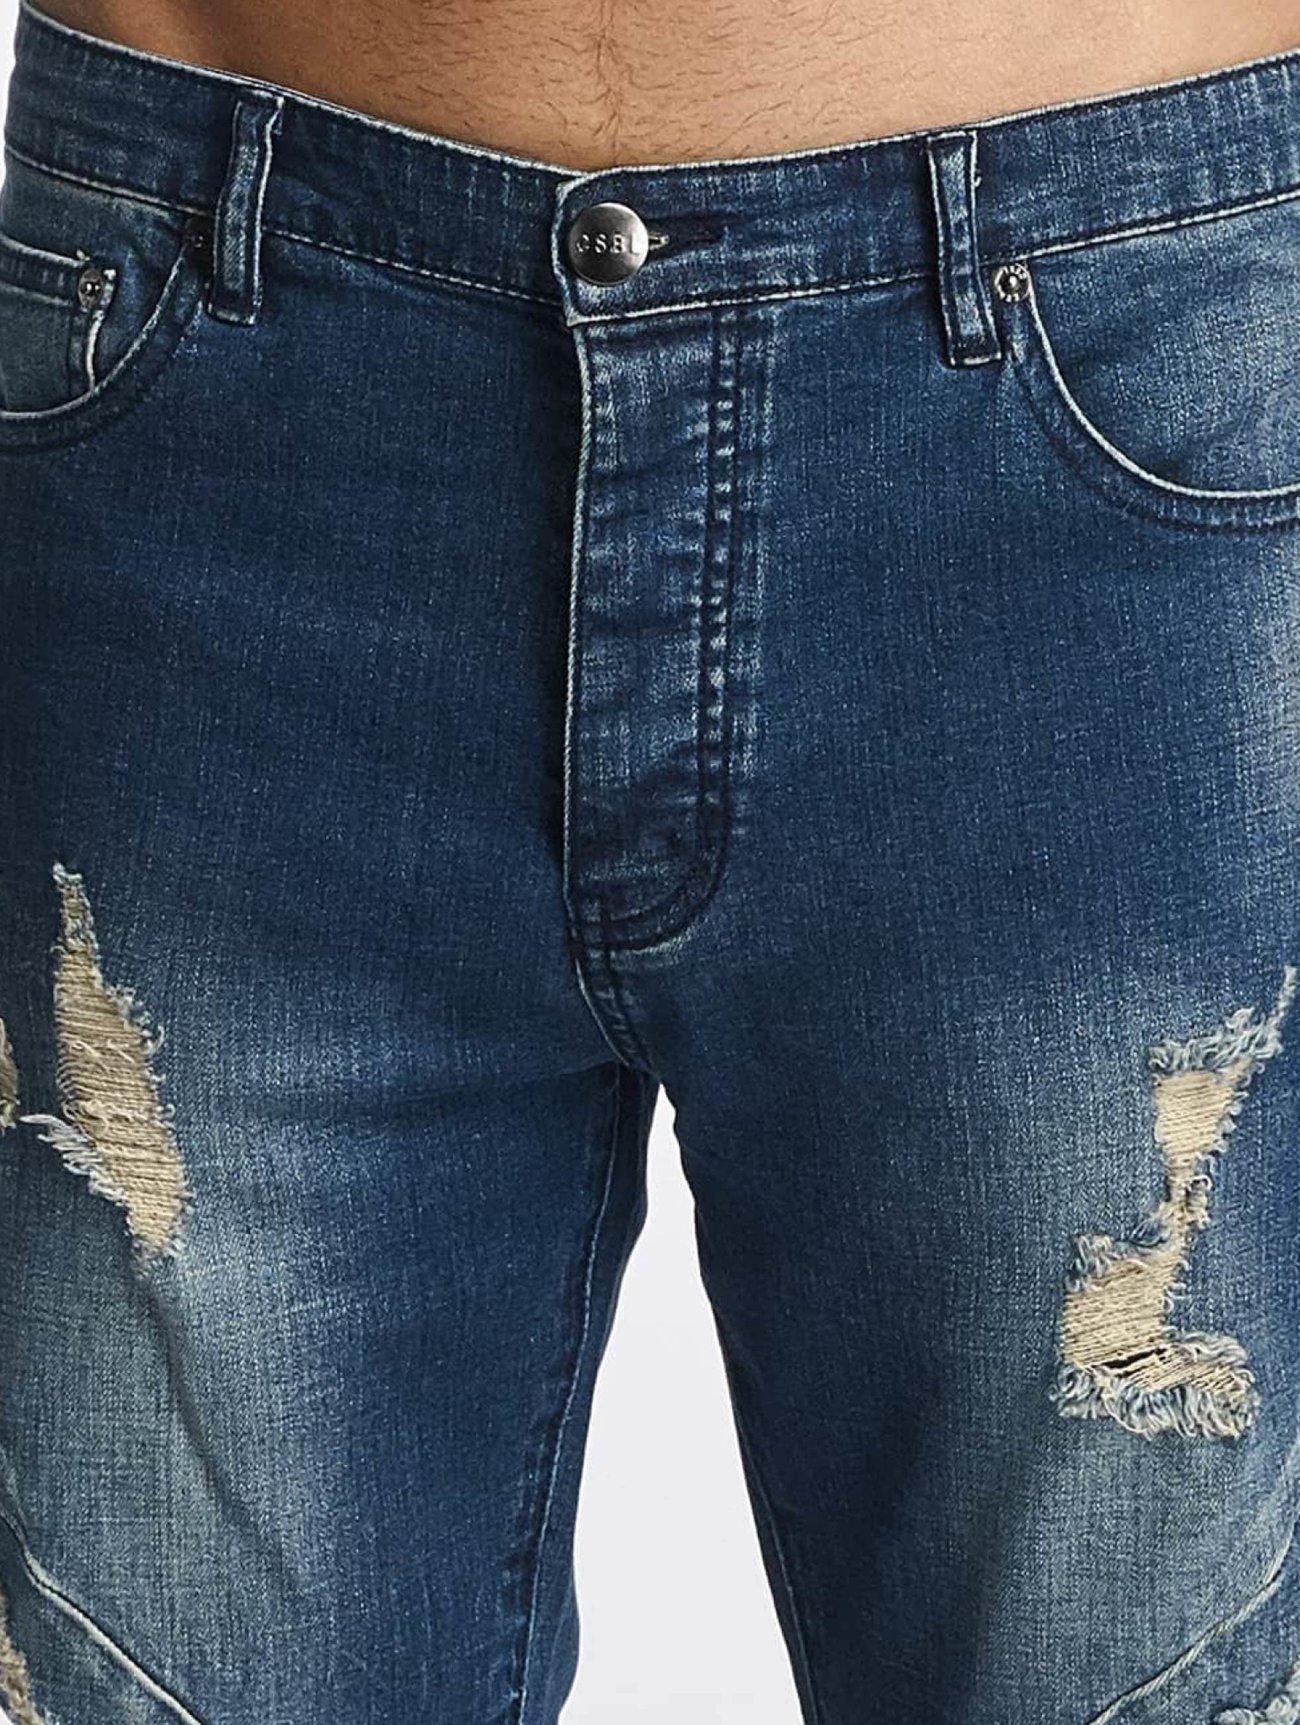 Cayler & Sons  ALLDD Paneled Denim  bleu Homme Jean slim  374685 Homme Jeans